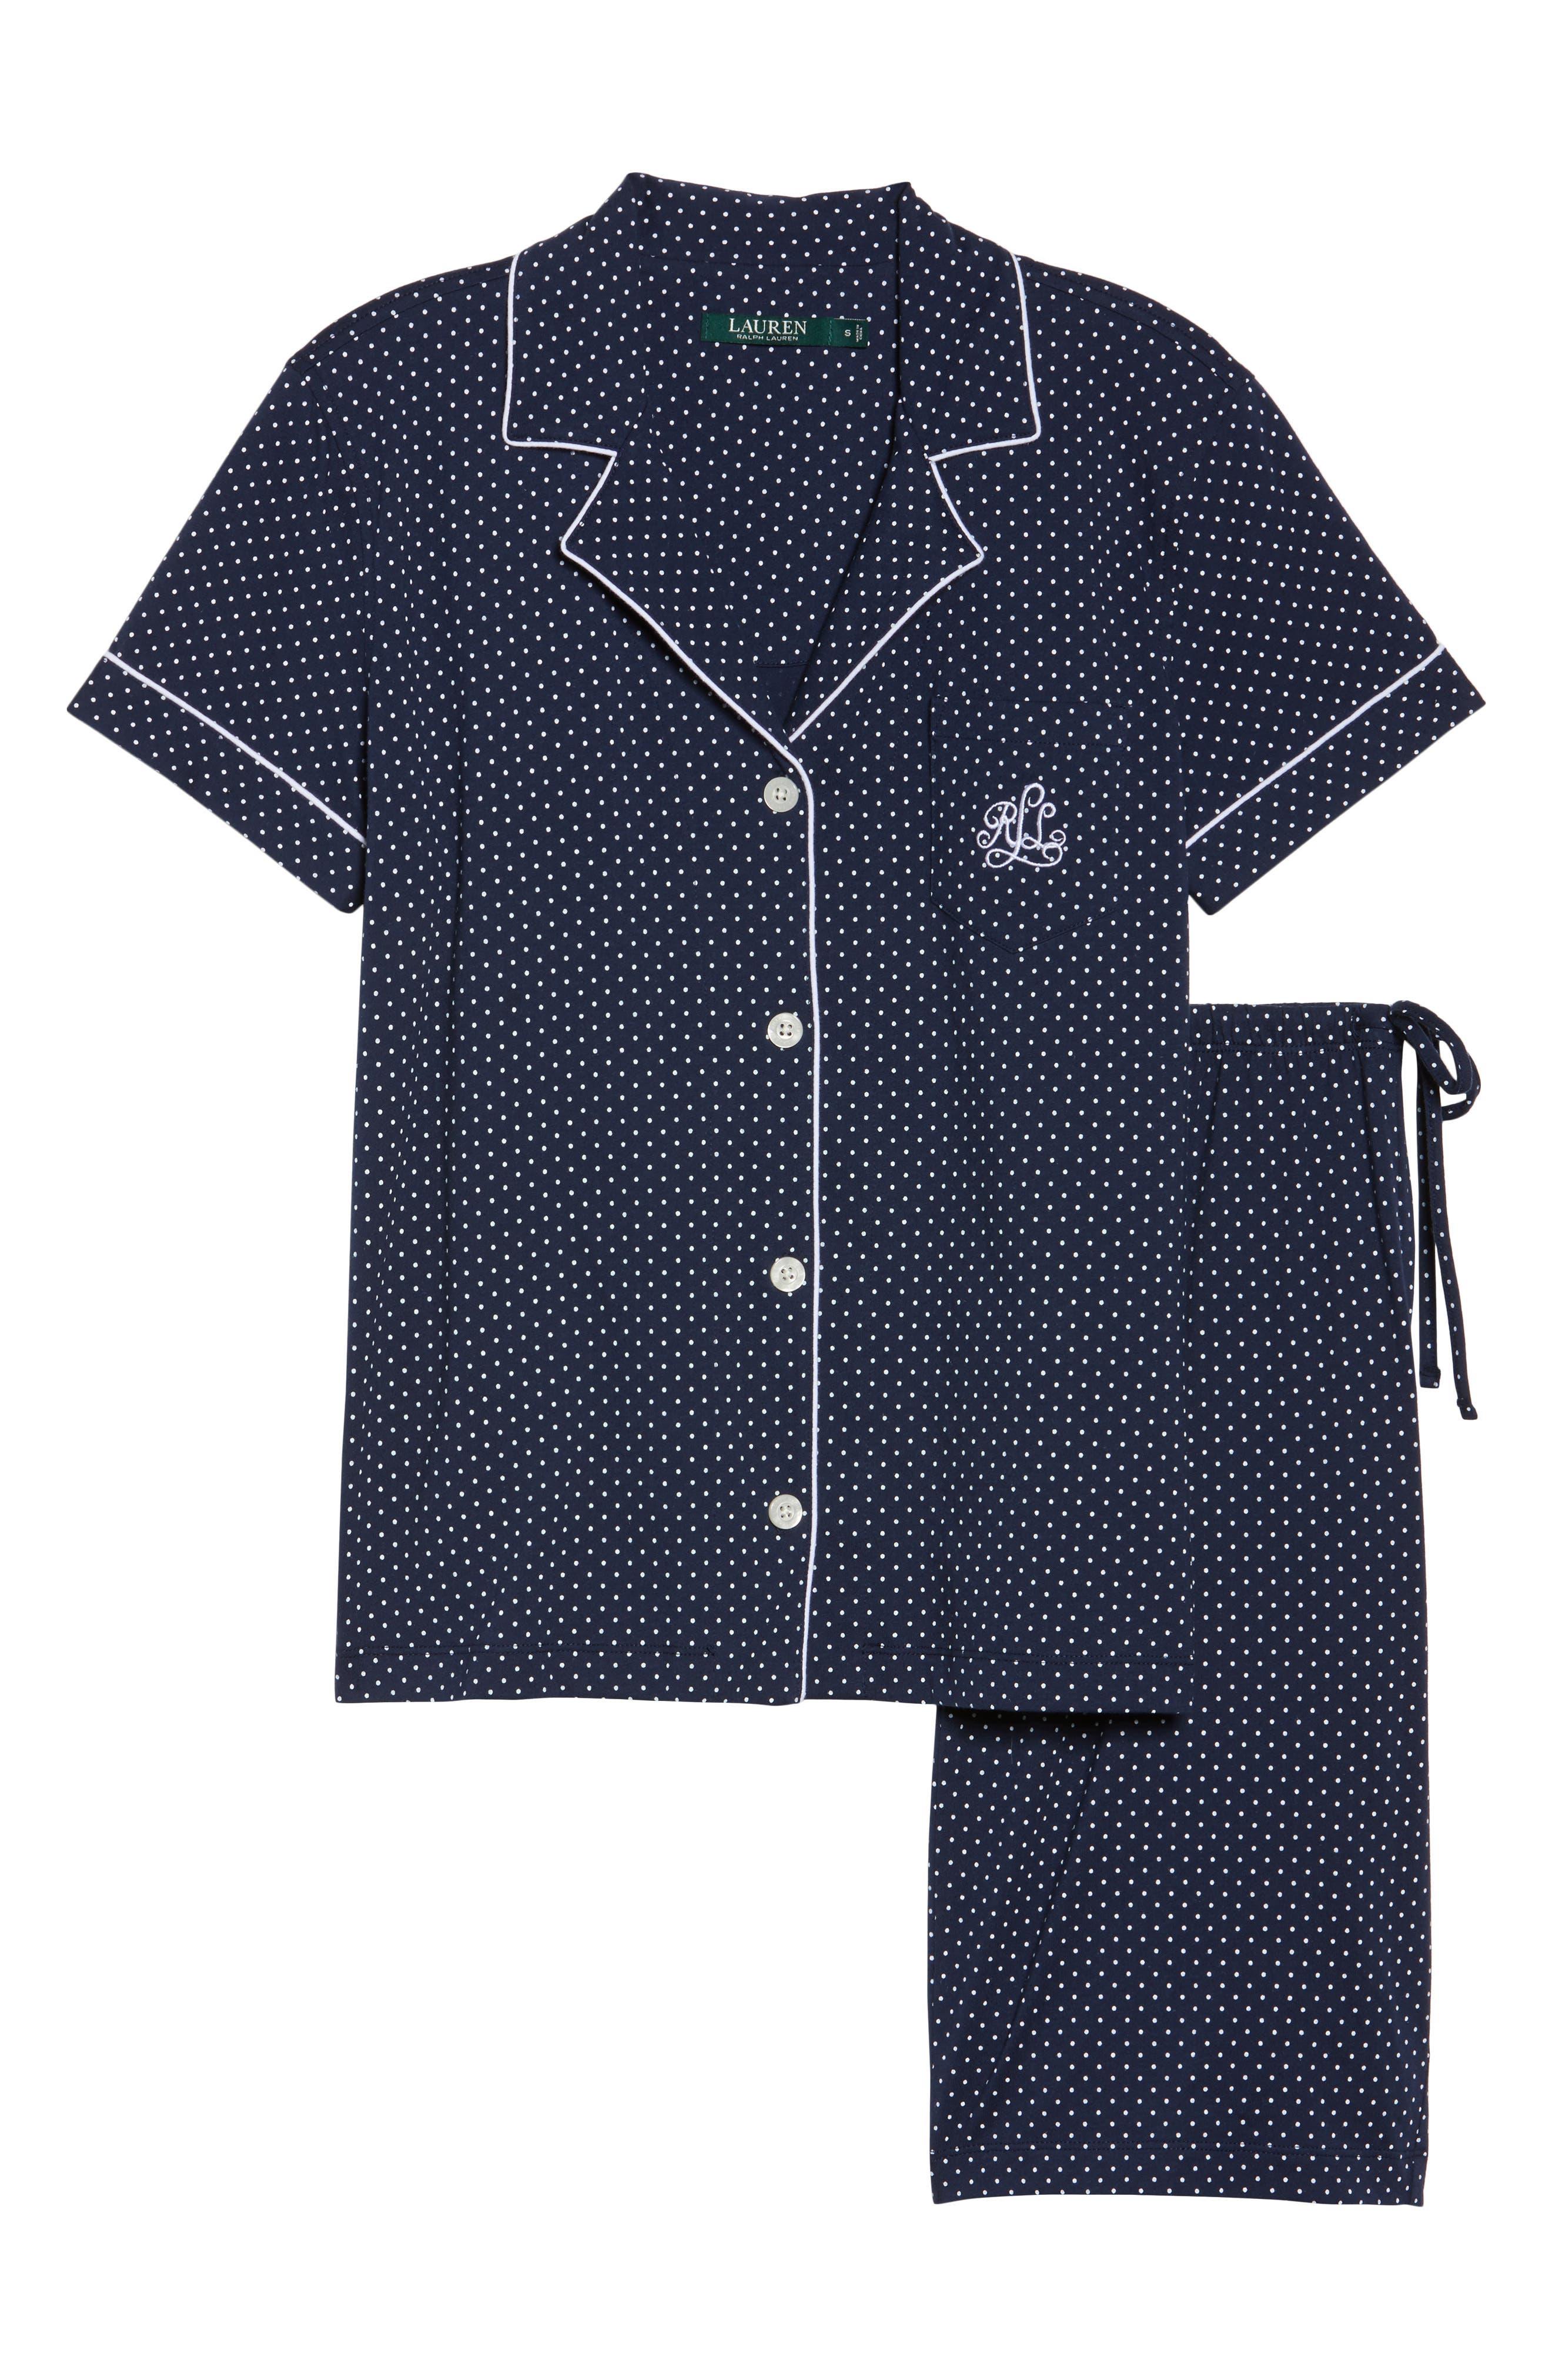 Bermuda Pajamas,                             Alternate thumbnail 6, color,                             Navy Dot